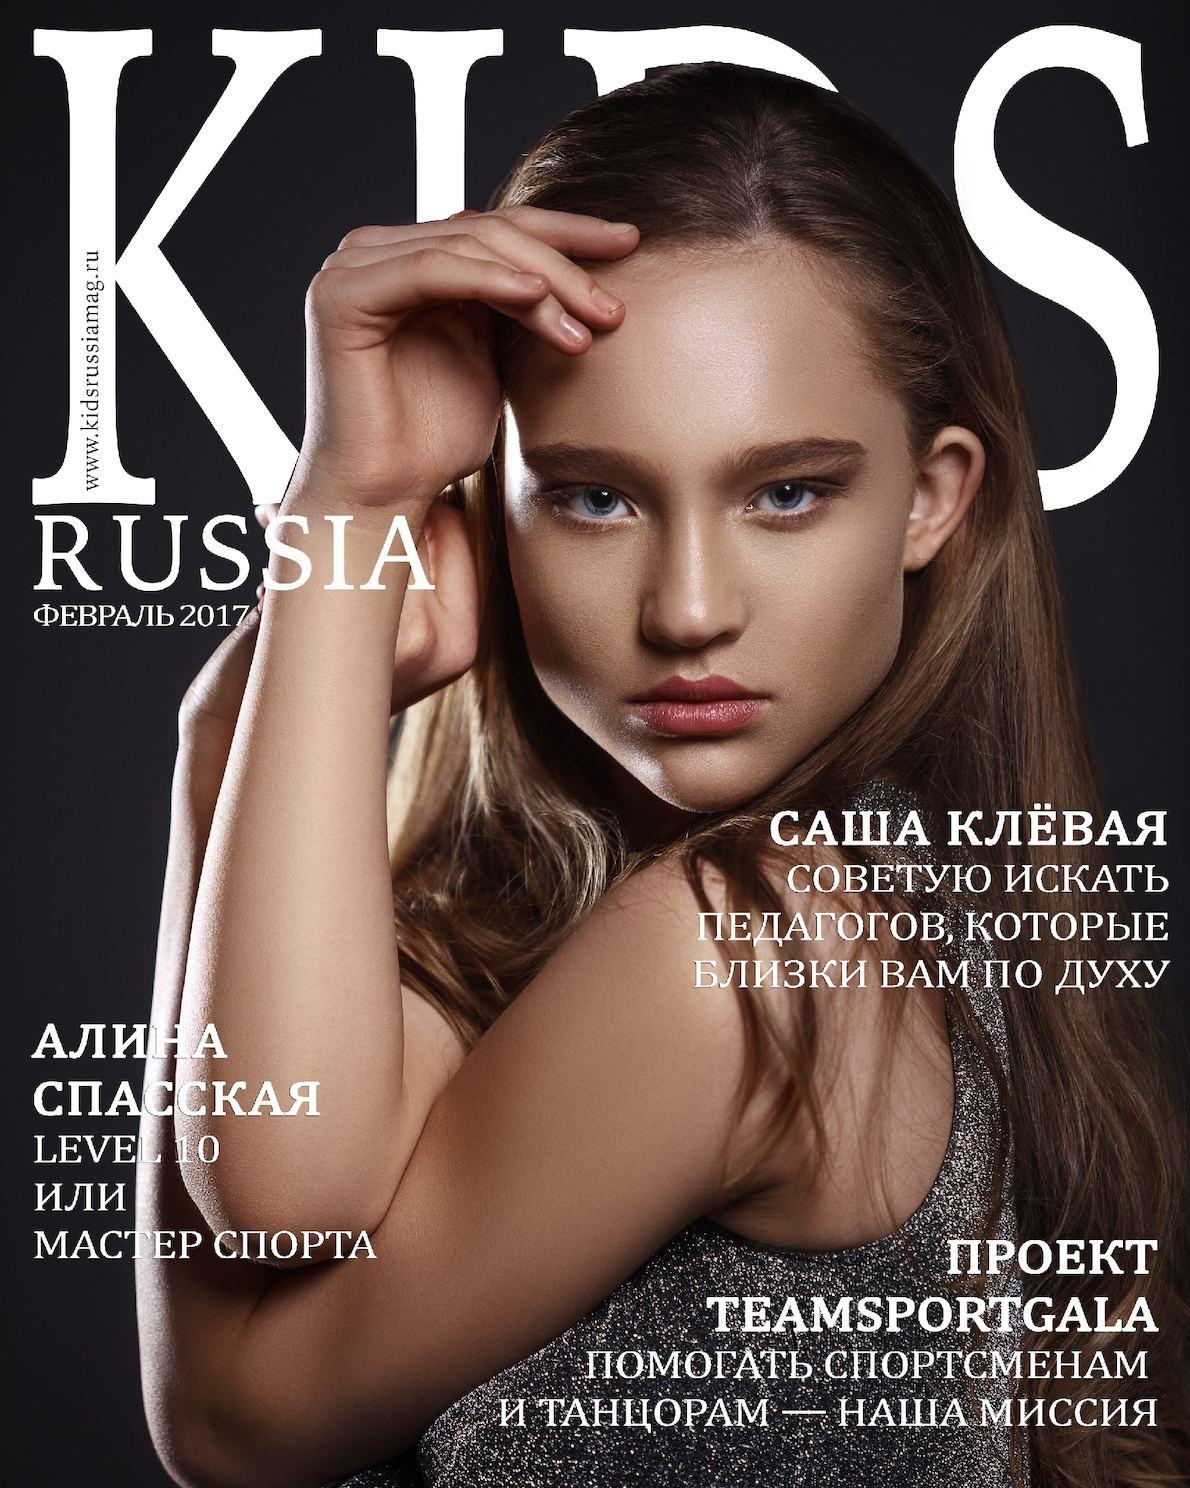 Kids Russia - Журнал о талантливых детях Февраль 2017